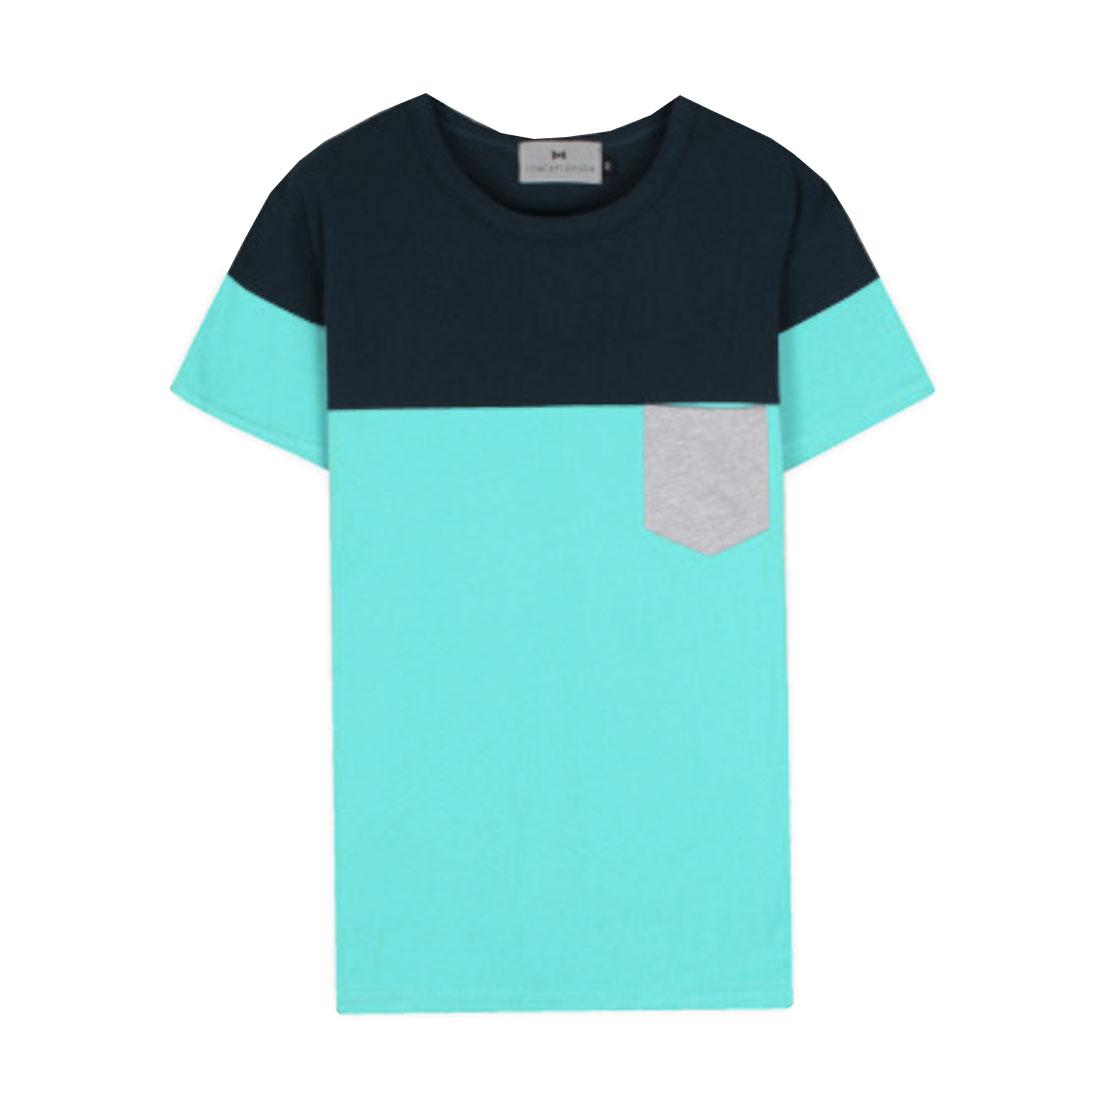 Man Round Neck Short Sleeve Chest Pockets Shirt Sky Blue Steel Blue S